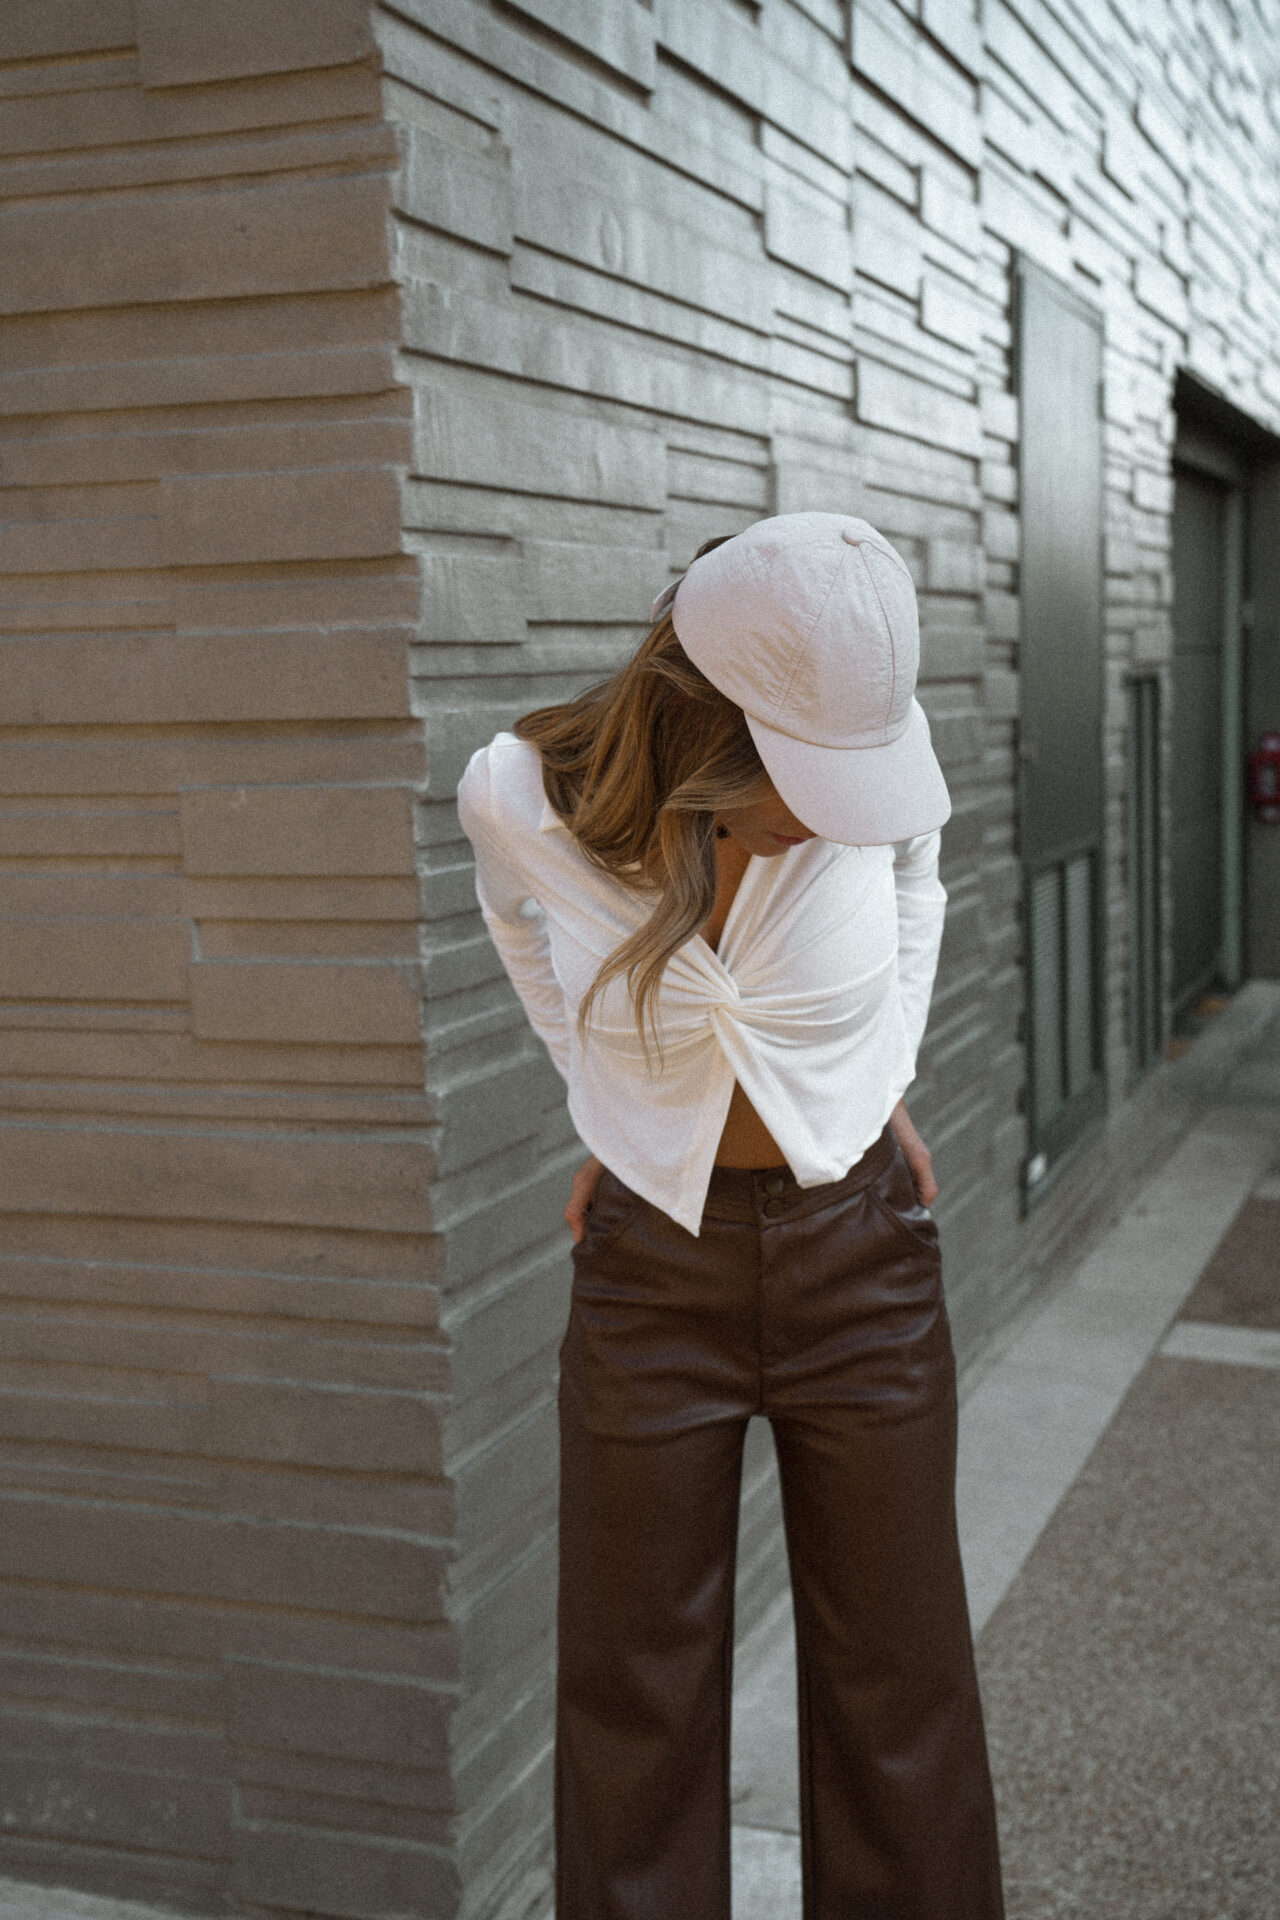 top-chemise-blanc-casquette-pantalon-simili-marron-femme-gisette-store (19)